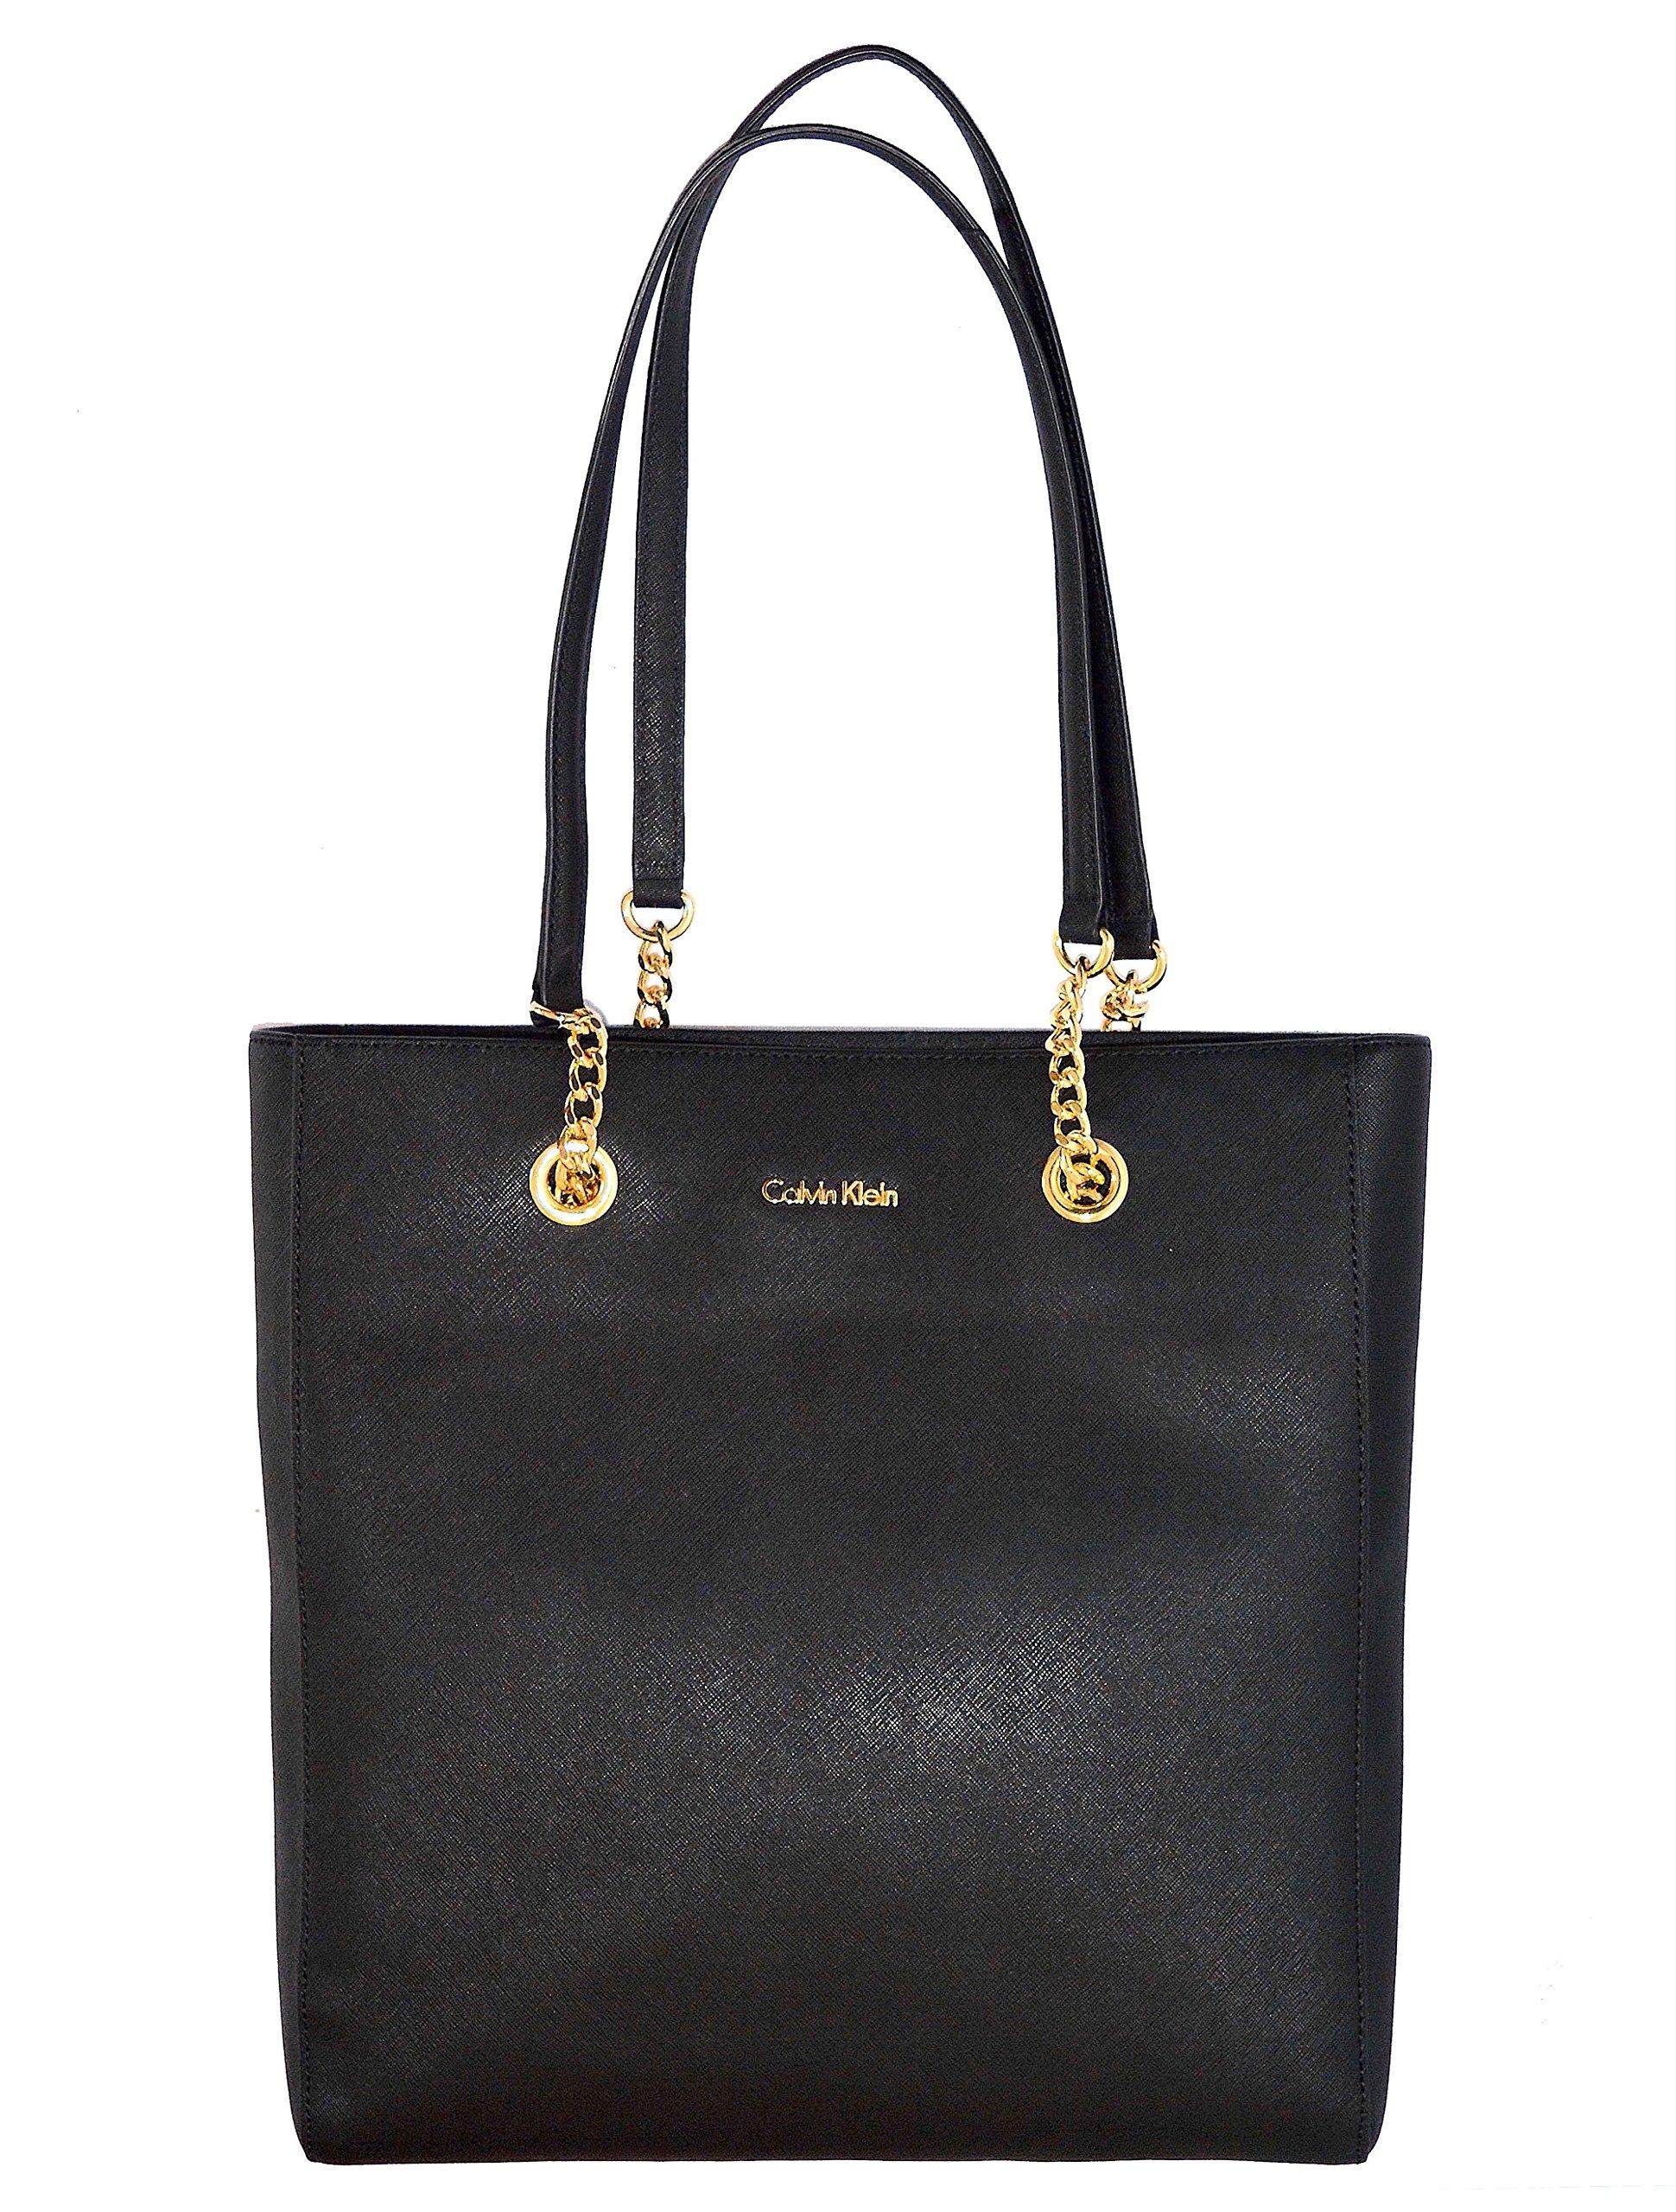 Calvin Klein Saffiano Leather Handbag Bag Purse Womens